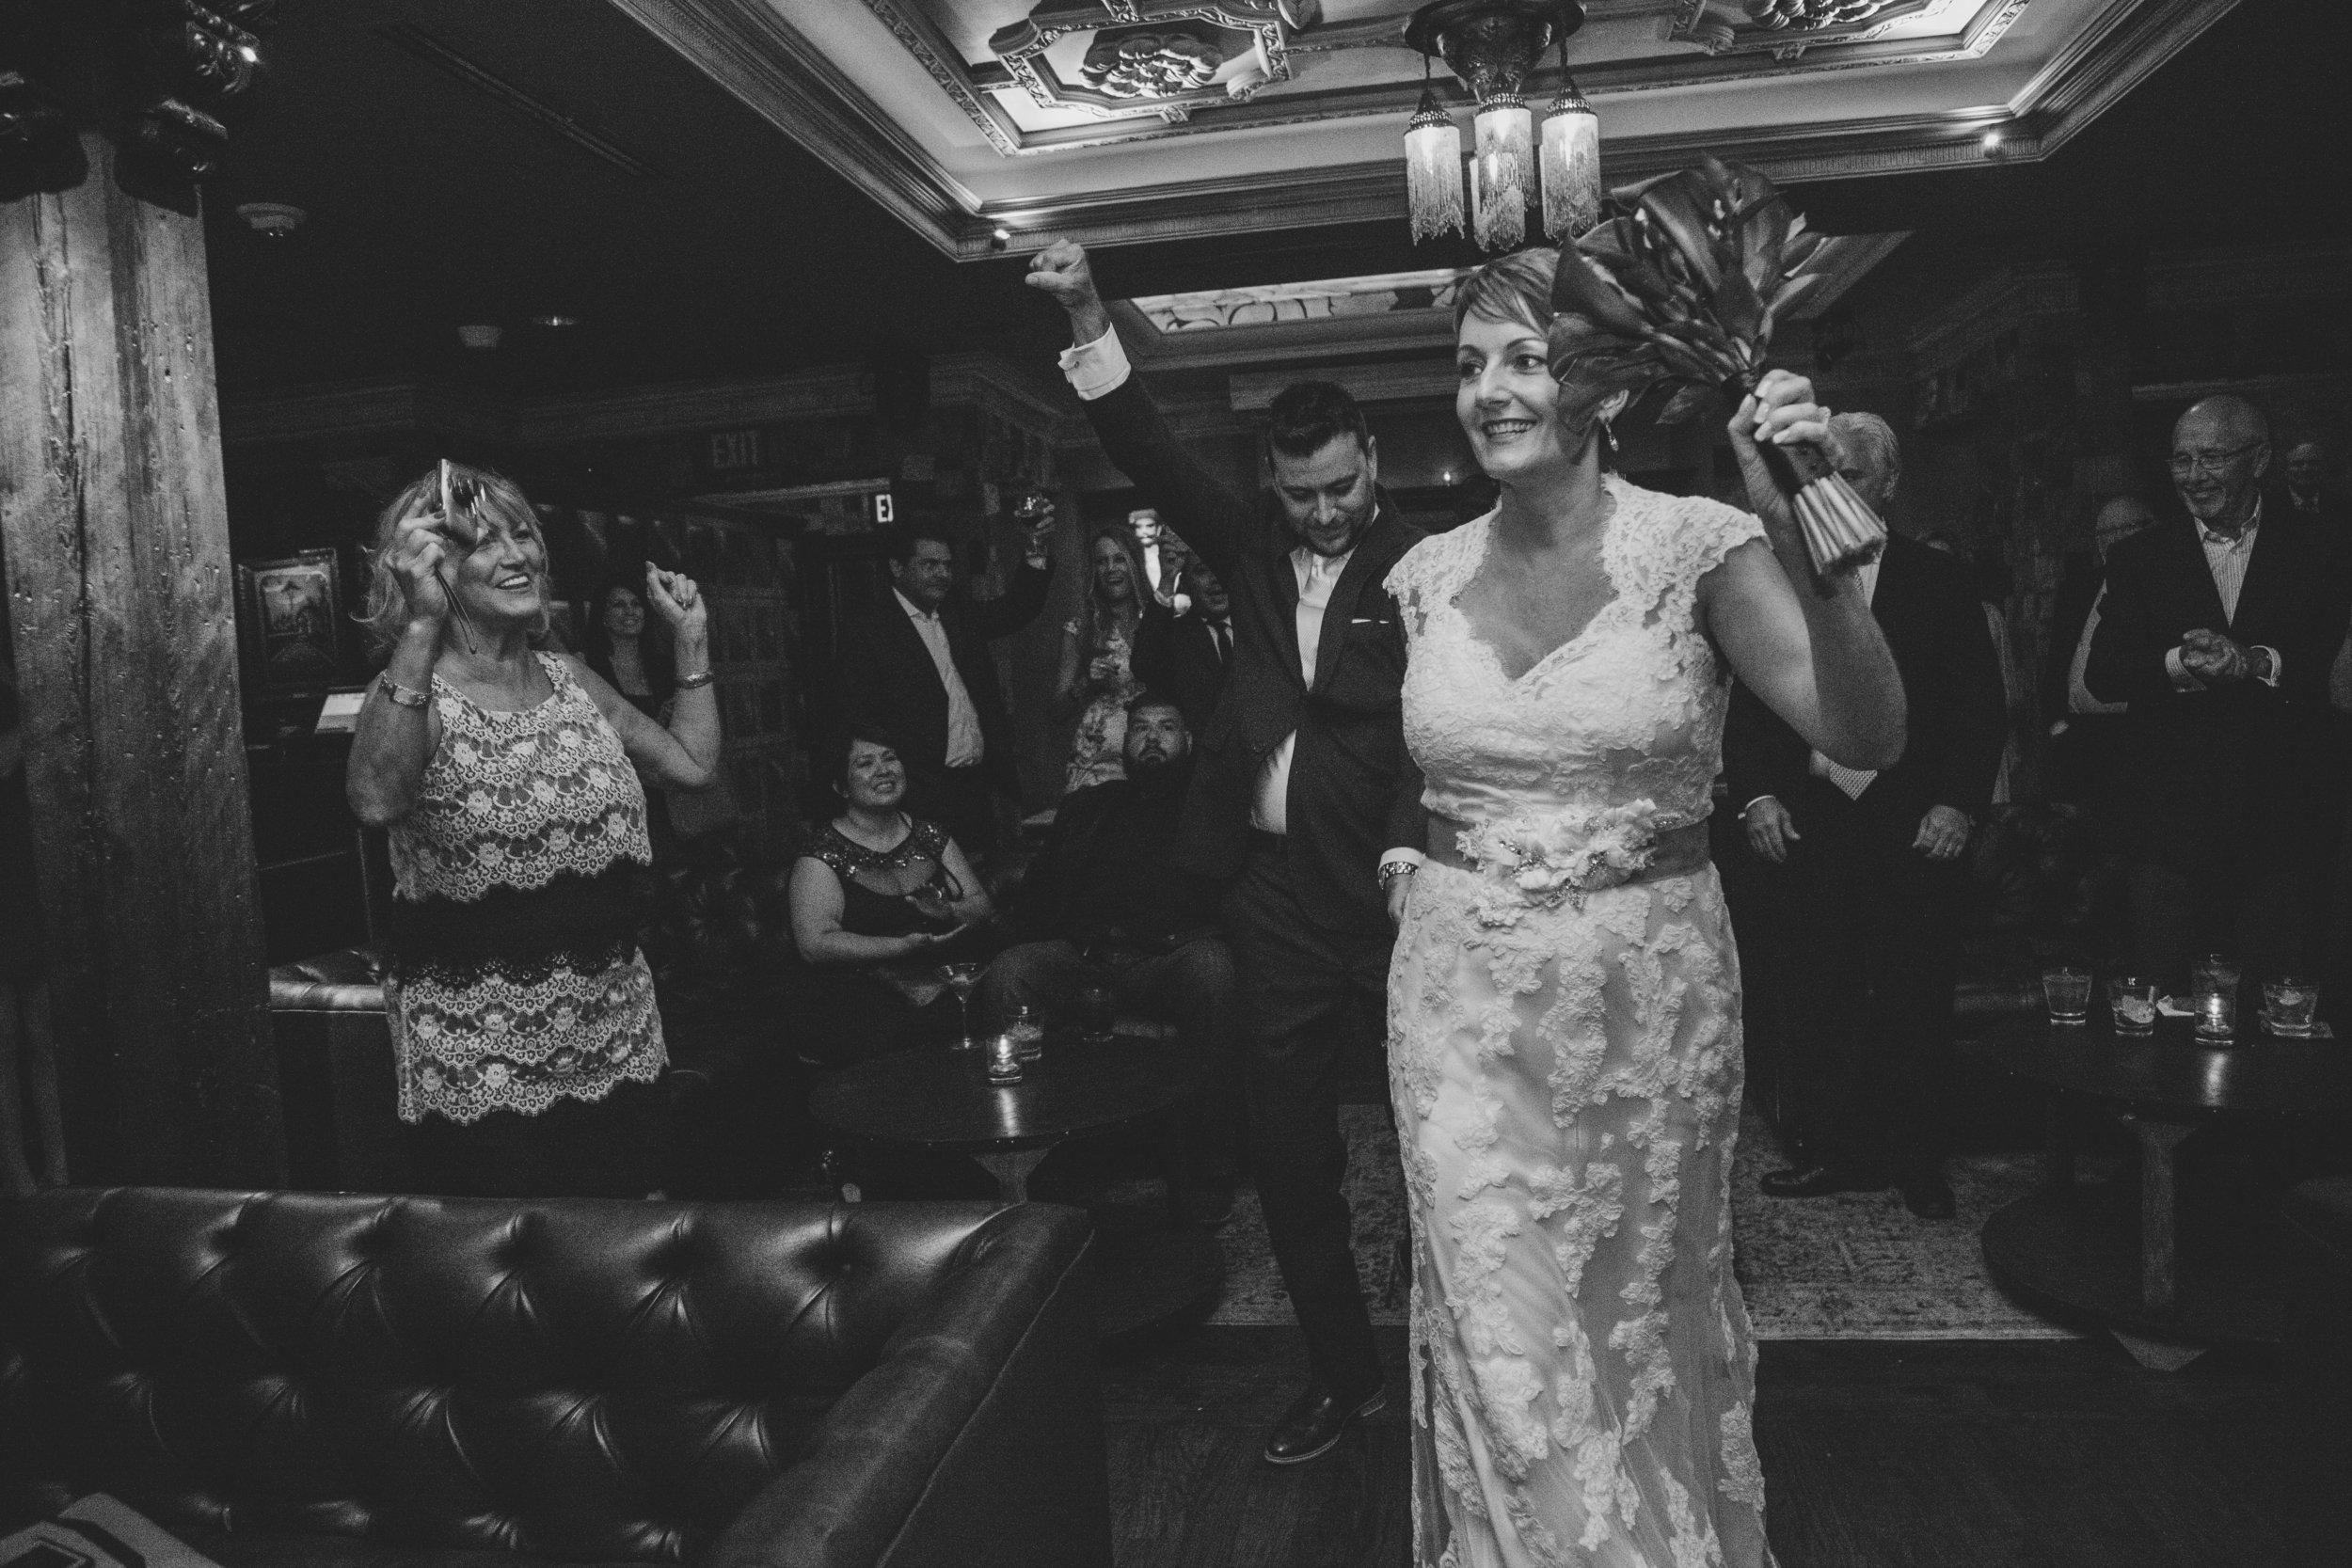 ATGI_Kat and Gabe Wedding 2016_2S8A5662.jpg